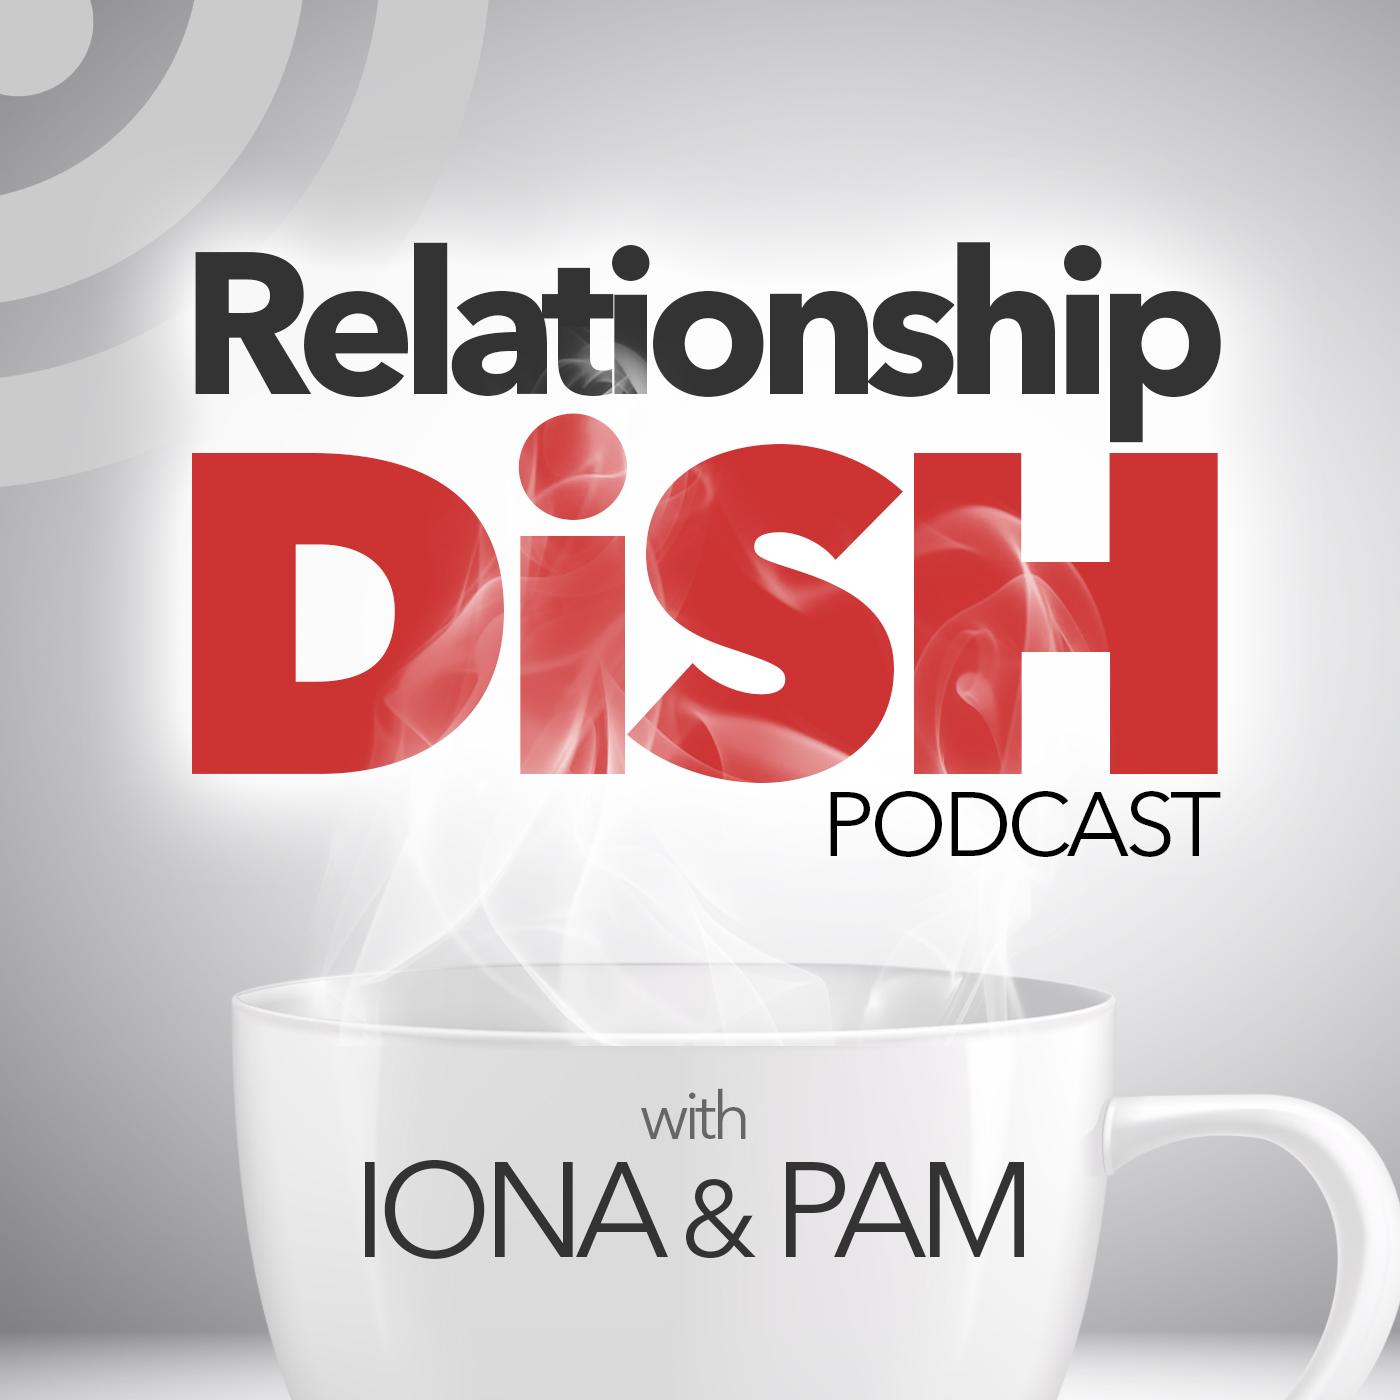 Relationship Dish - ep 041 Hallowe'en Episode What Scares Us.